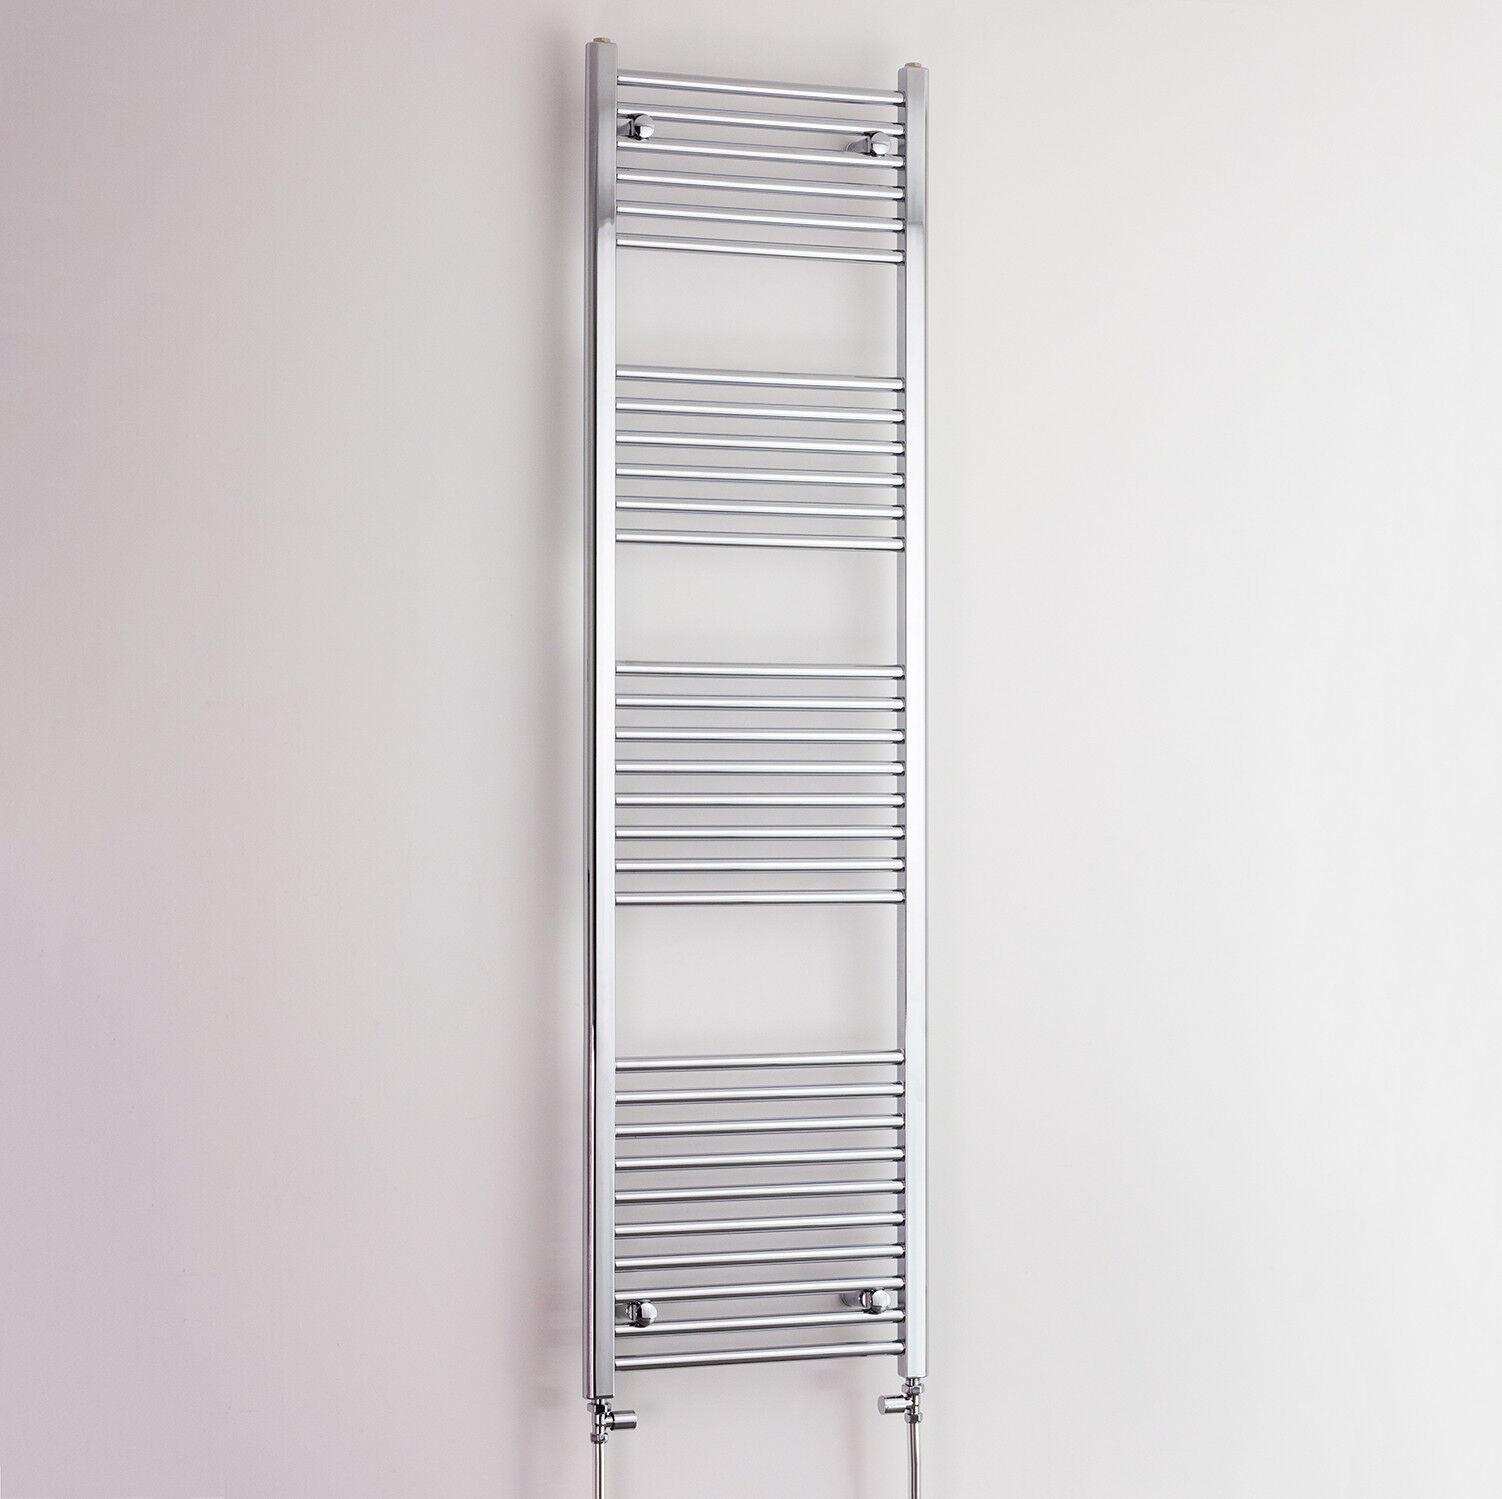 500 x 1800 Chrome Sèche-serviettes plat ou Incurvé Radiateur pour chauffage central